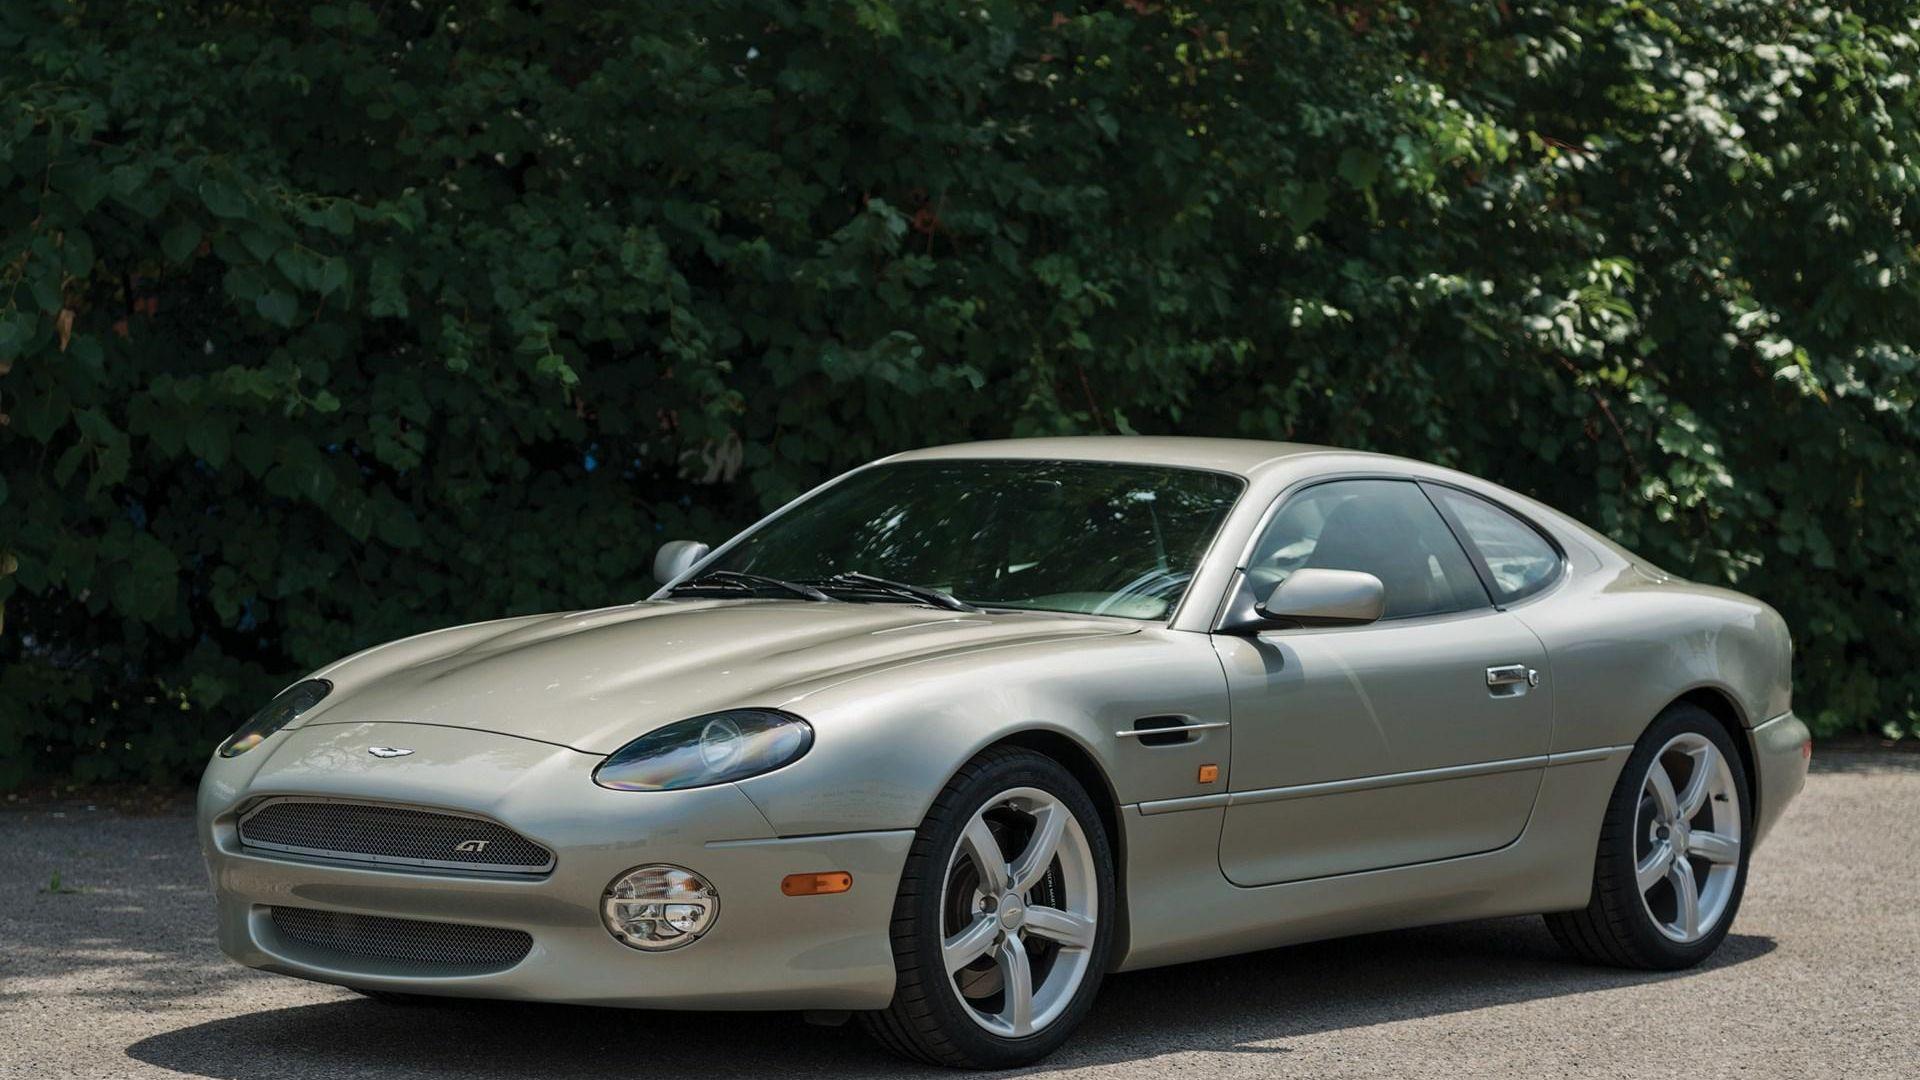 2003 Aston Martin Db7 Gt Vin Scfad22313k304279 Classic Com